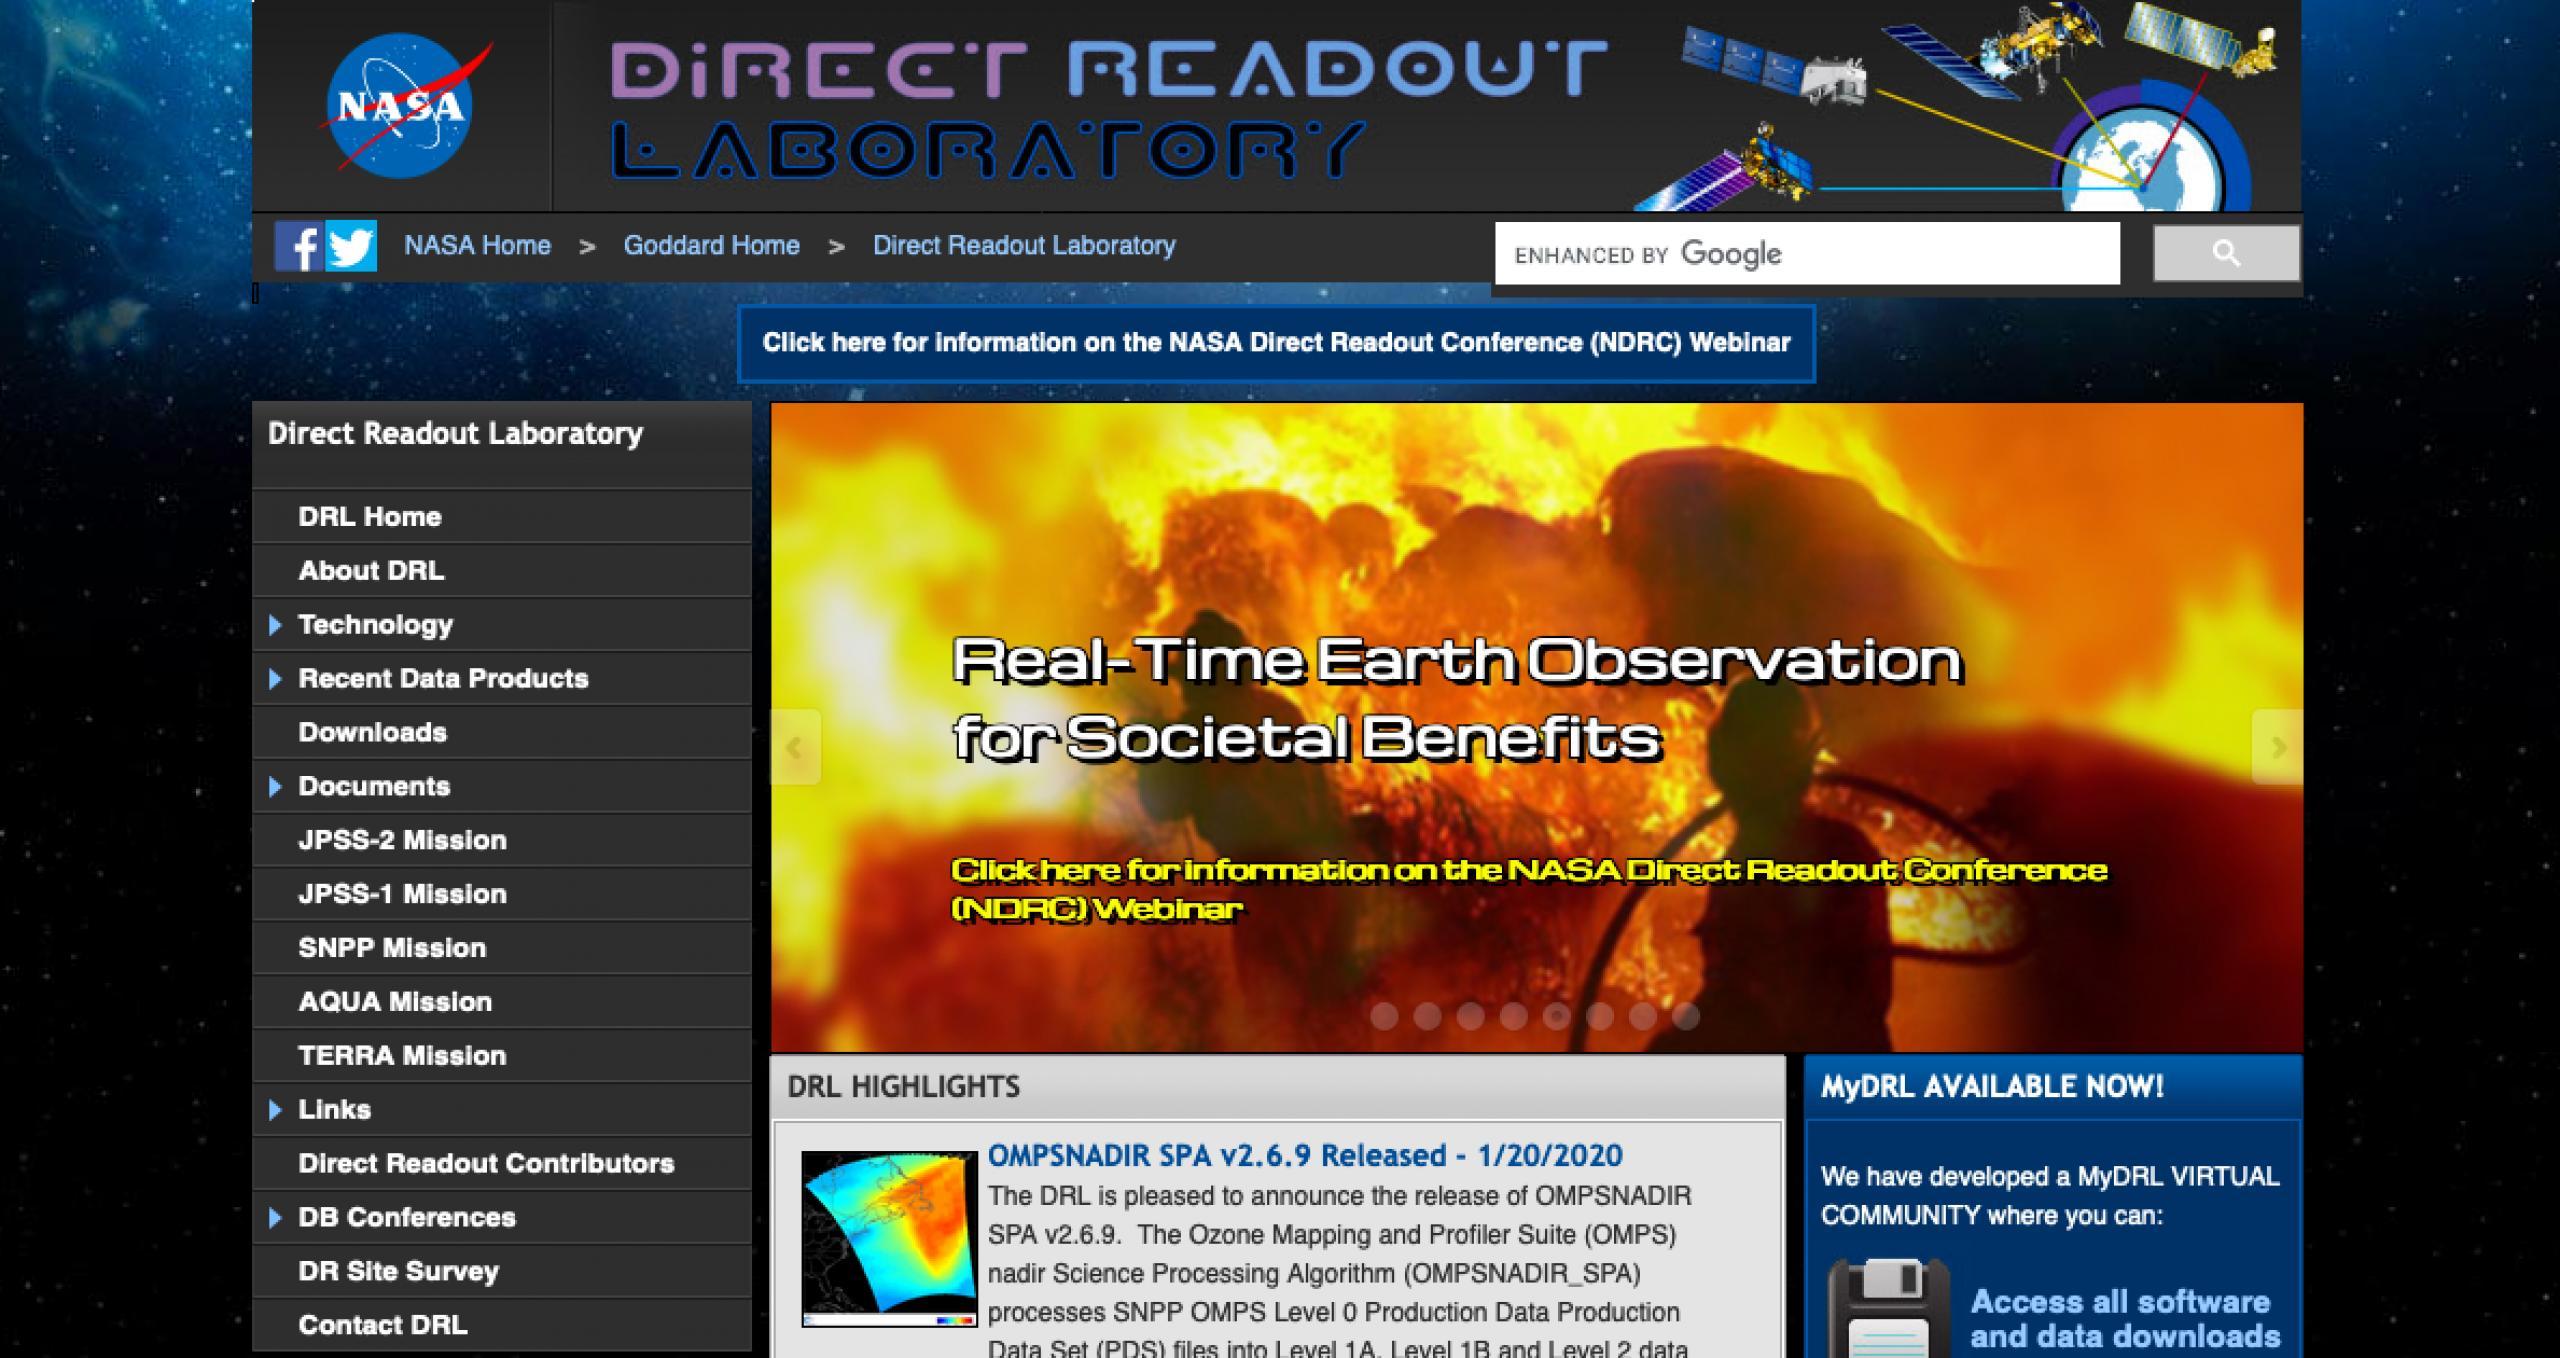 Screenshot of Direct Readout Laboratory website